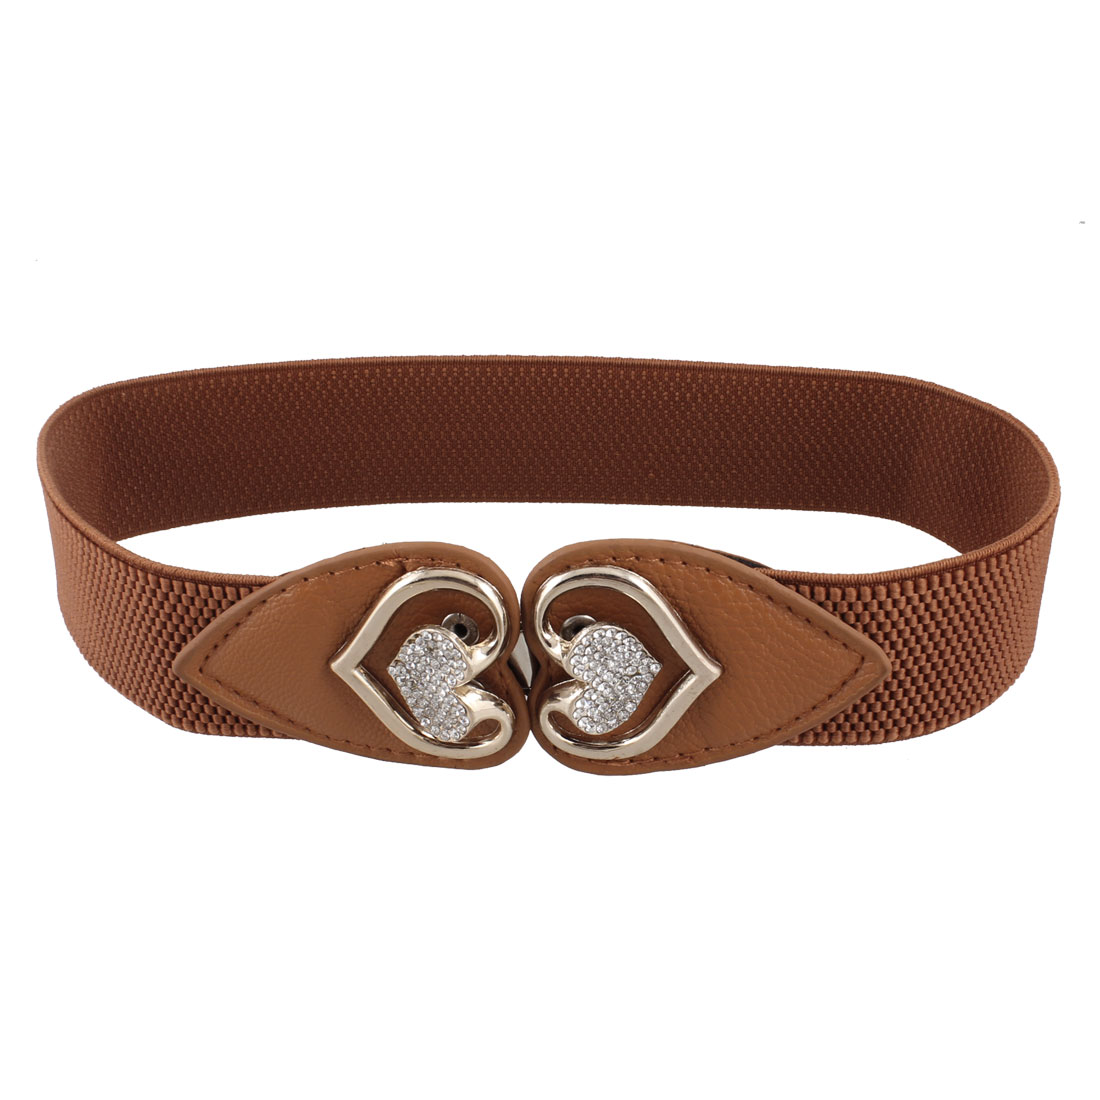 Lady Interlocking Buckle Rhinestone Heart Decor Stretchy Waist Belt Waistband Brown